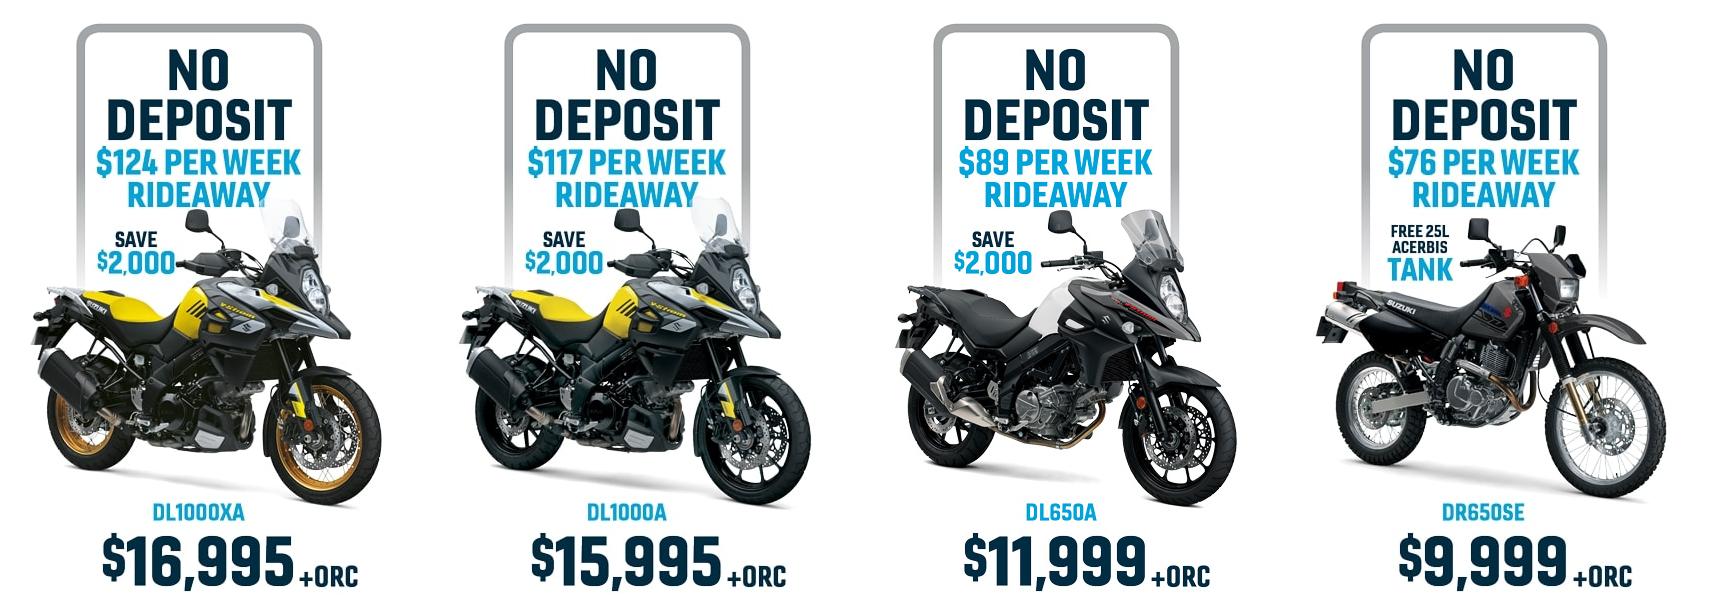 Suzuki Adventure Motorcycles